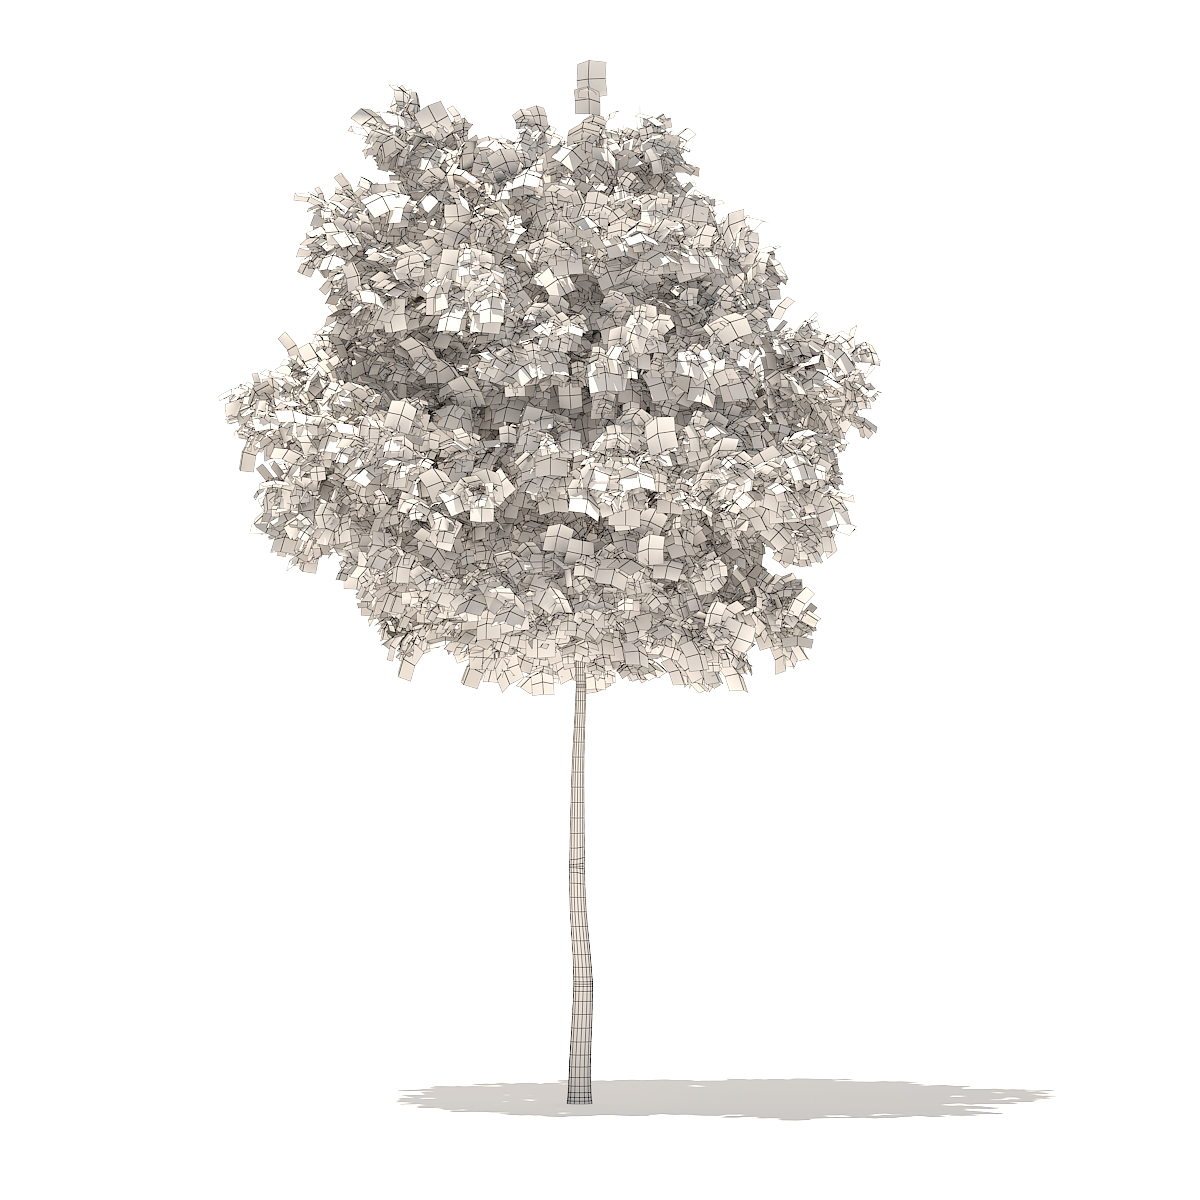 Sugar Maple 3D Model 5.2m